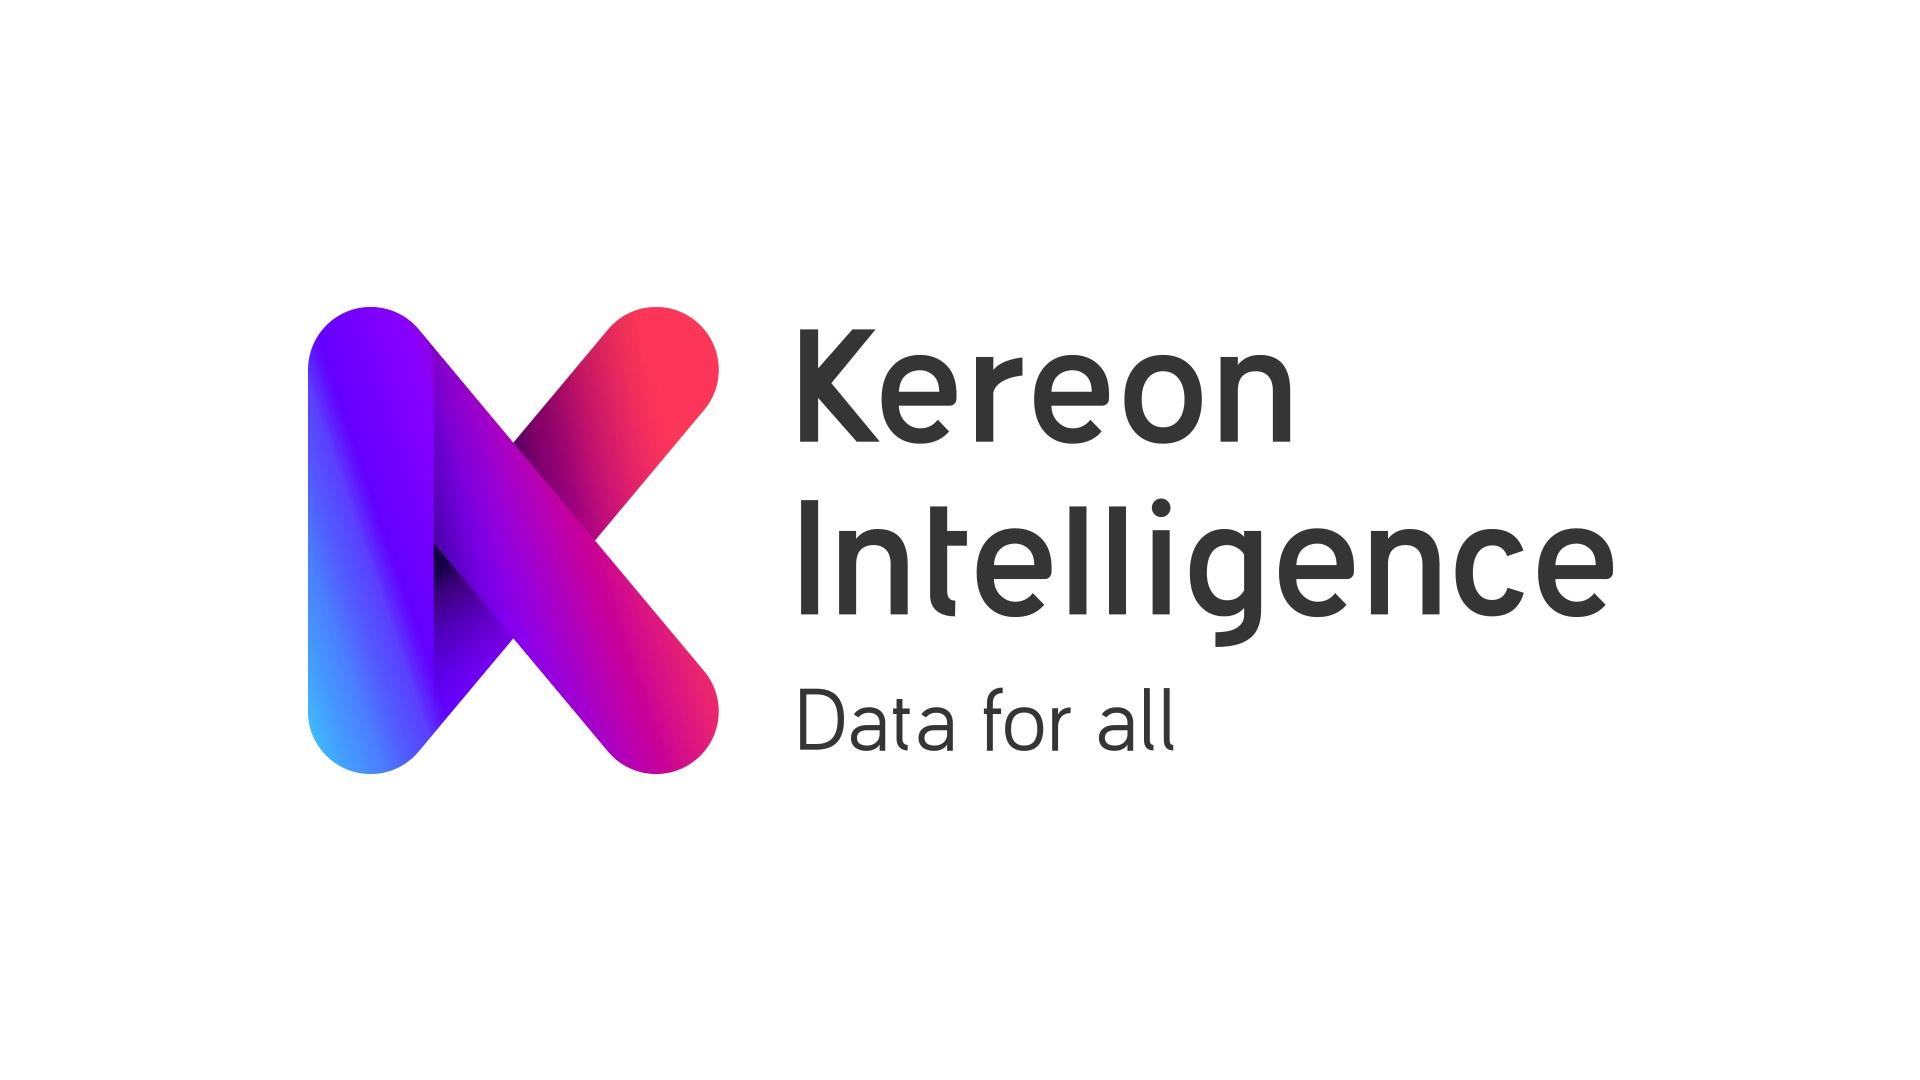 Kereon Intelligence